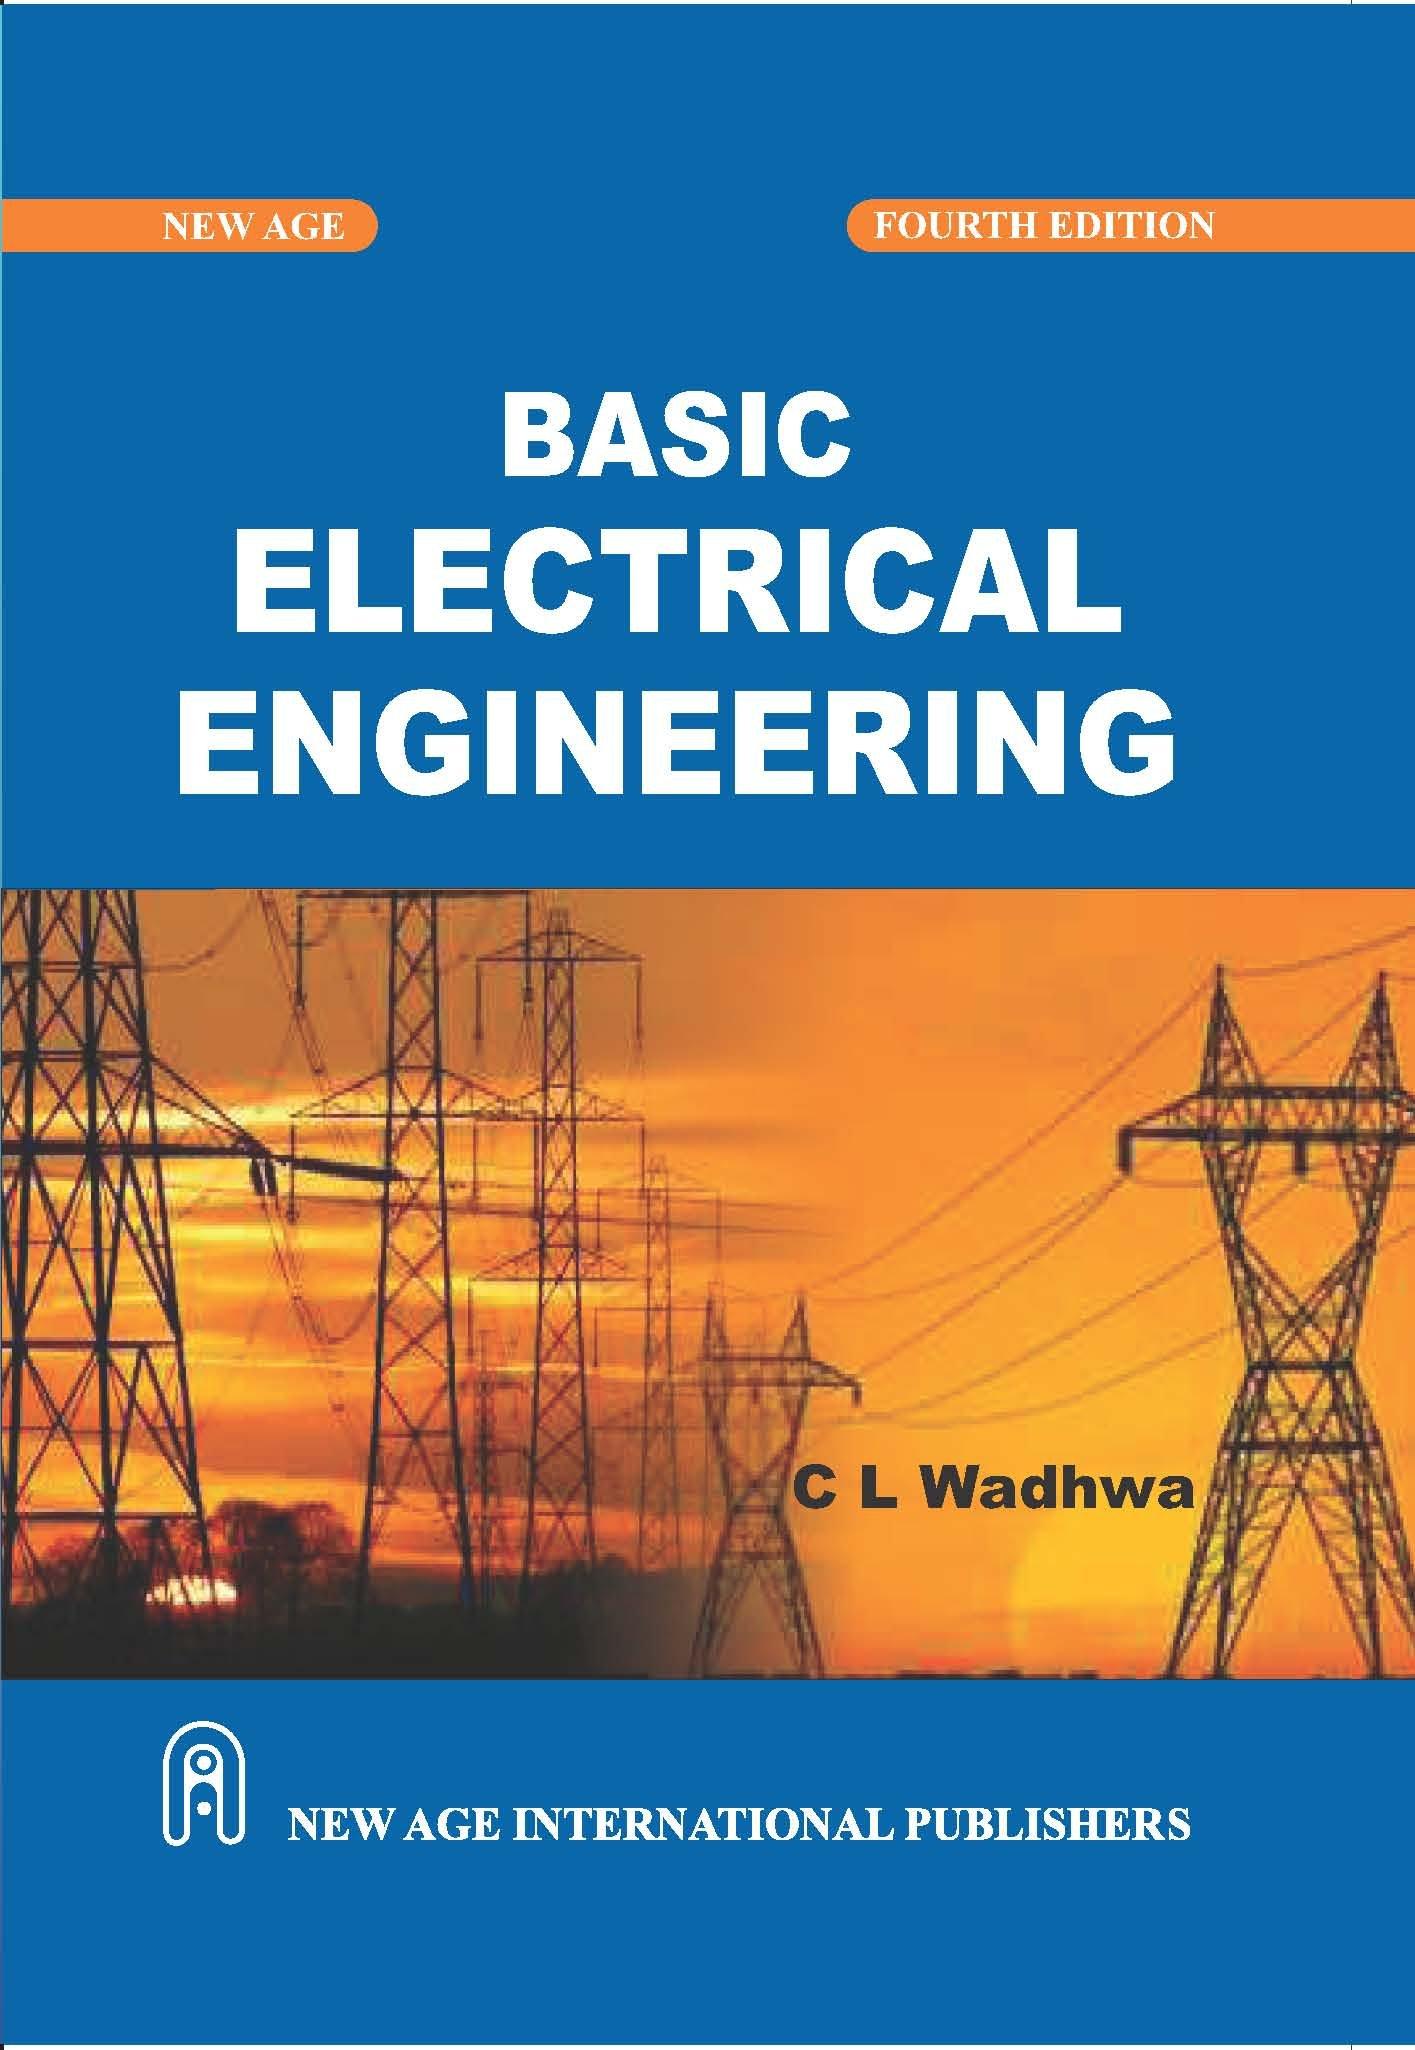 Basic Electrical Engineering By C L Wadhwa